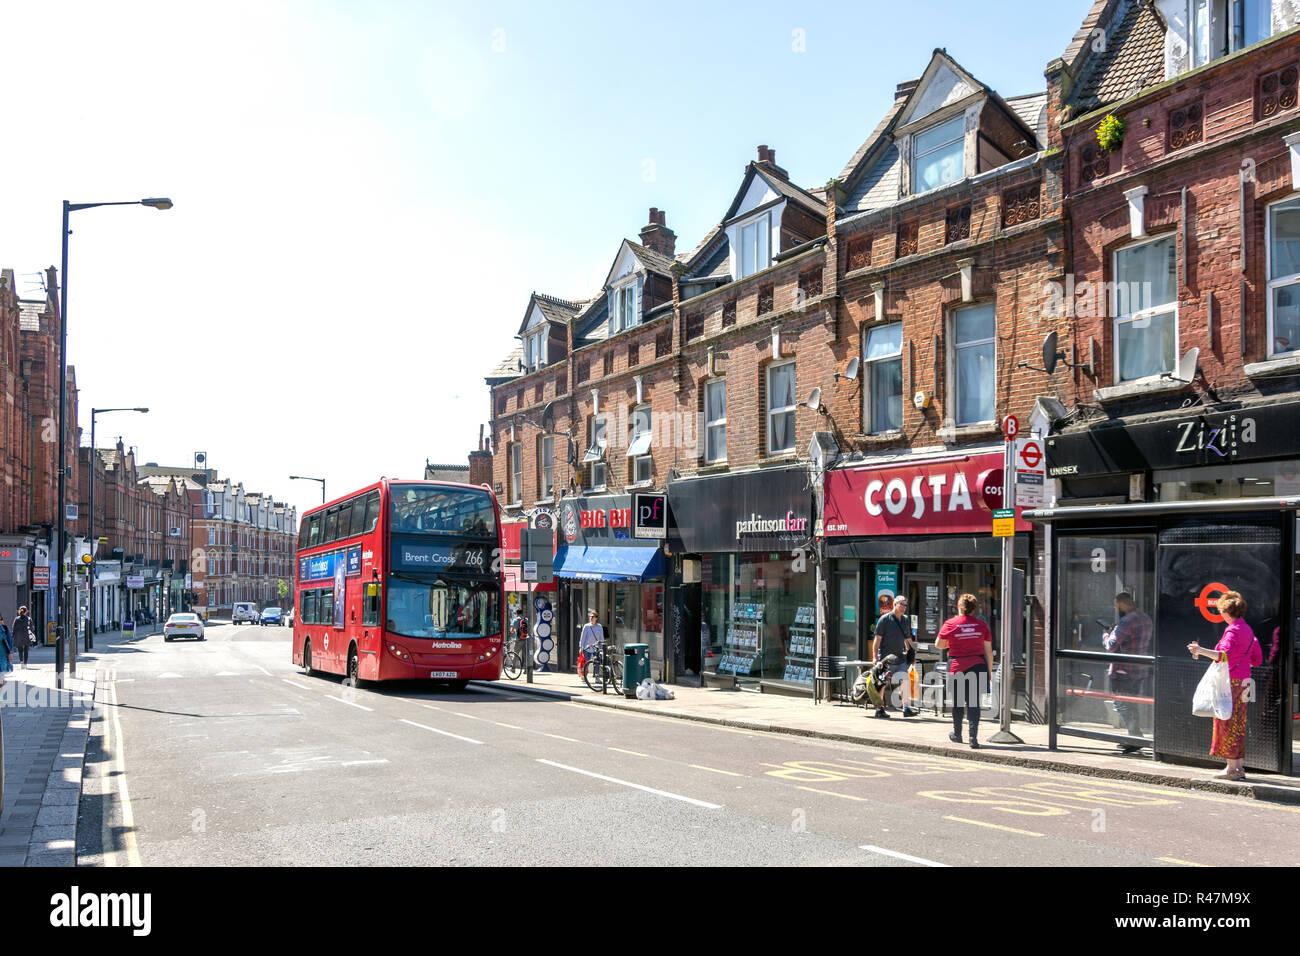 Walm Lane, Willesden Green, Willesden, London Borough of Brent, Greater London, England, United Kingdom - Stock Image